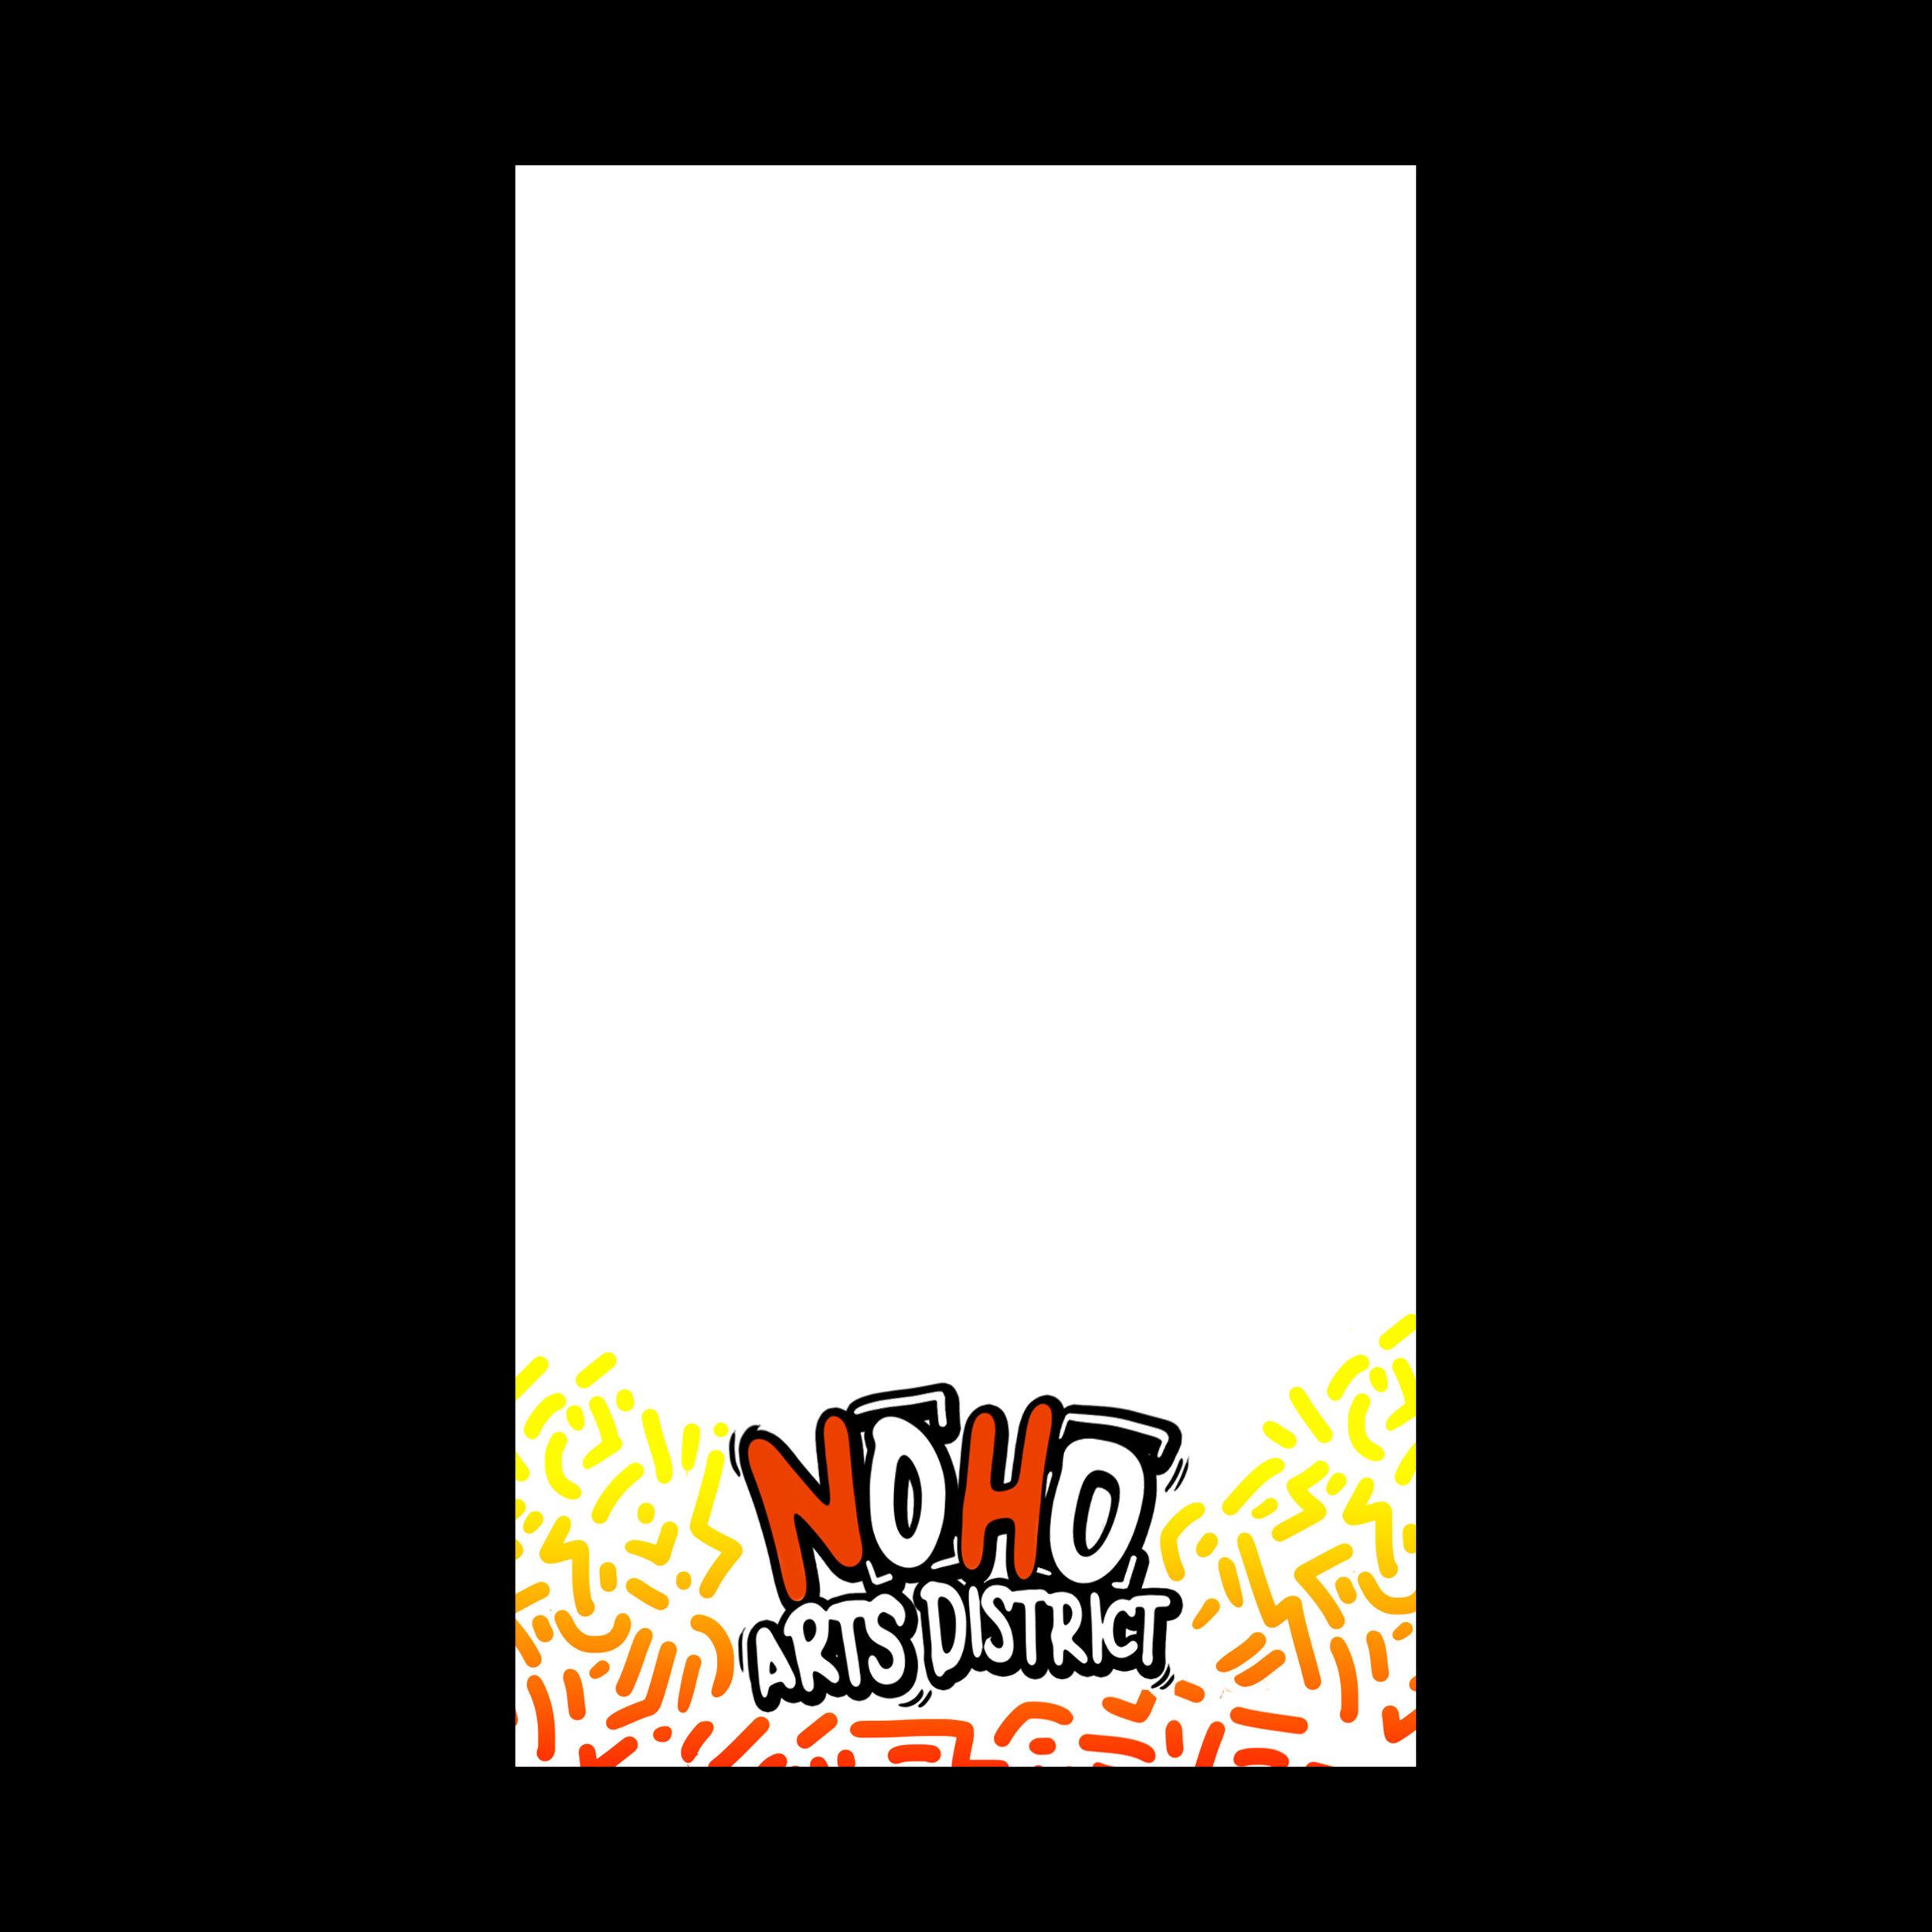 NOHO_ArtsDistrict_Snapchat_Filter_TDUB951_2016_Layout.jpg